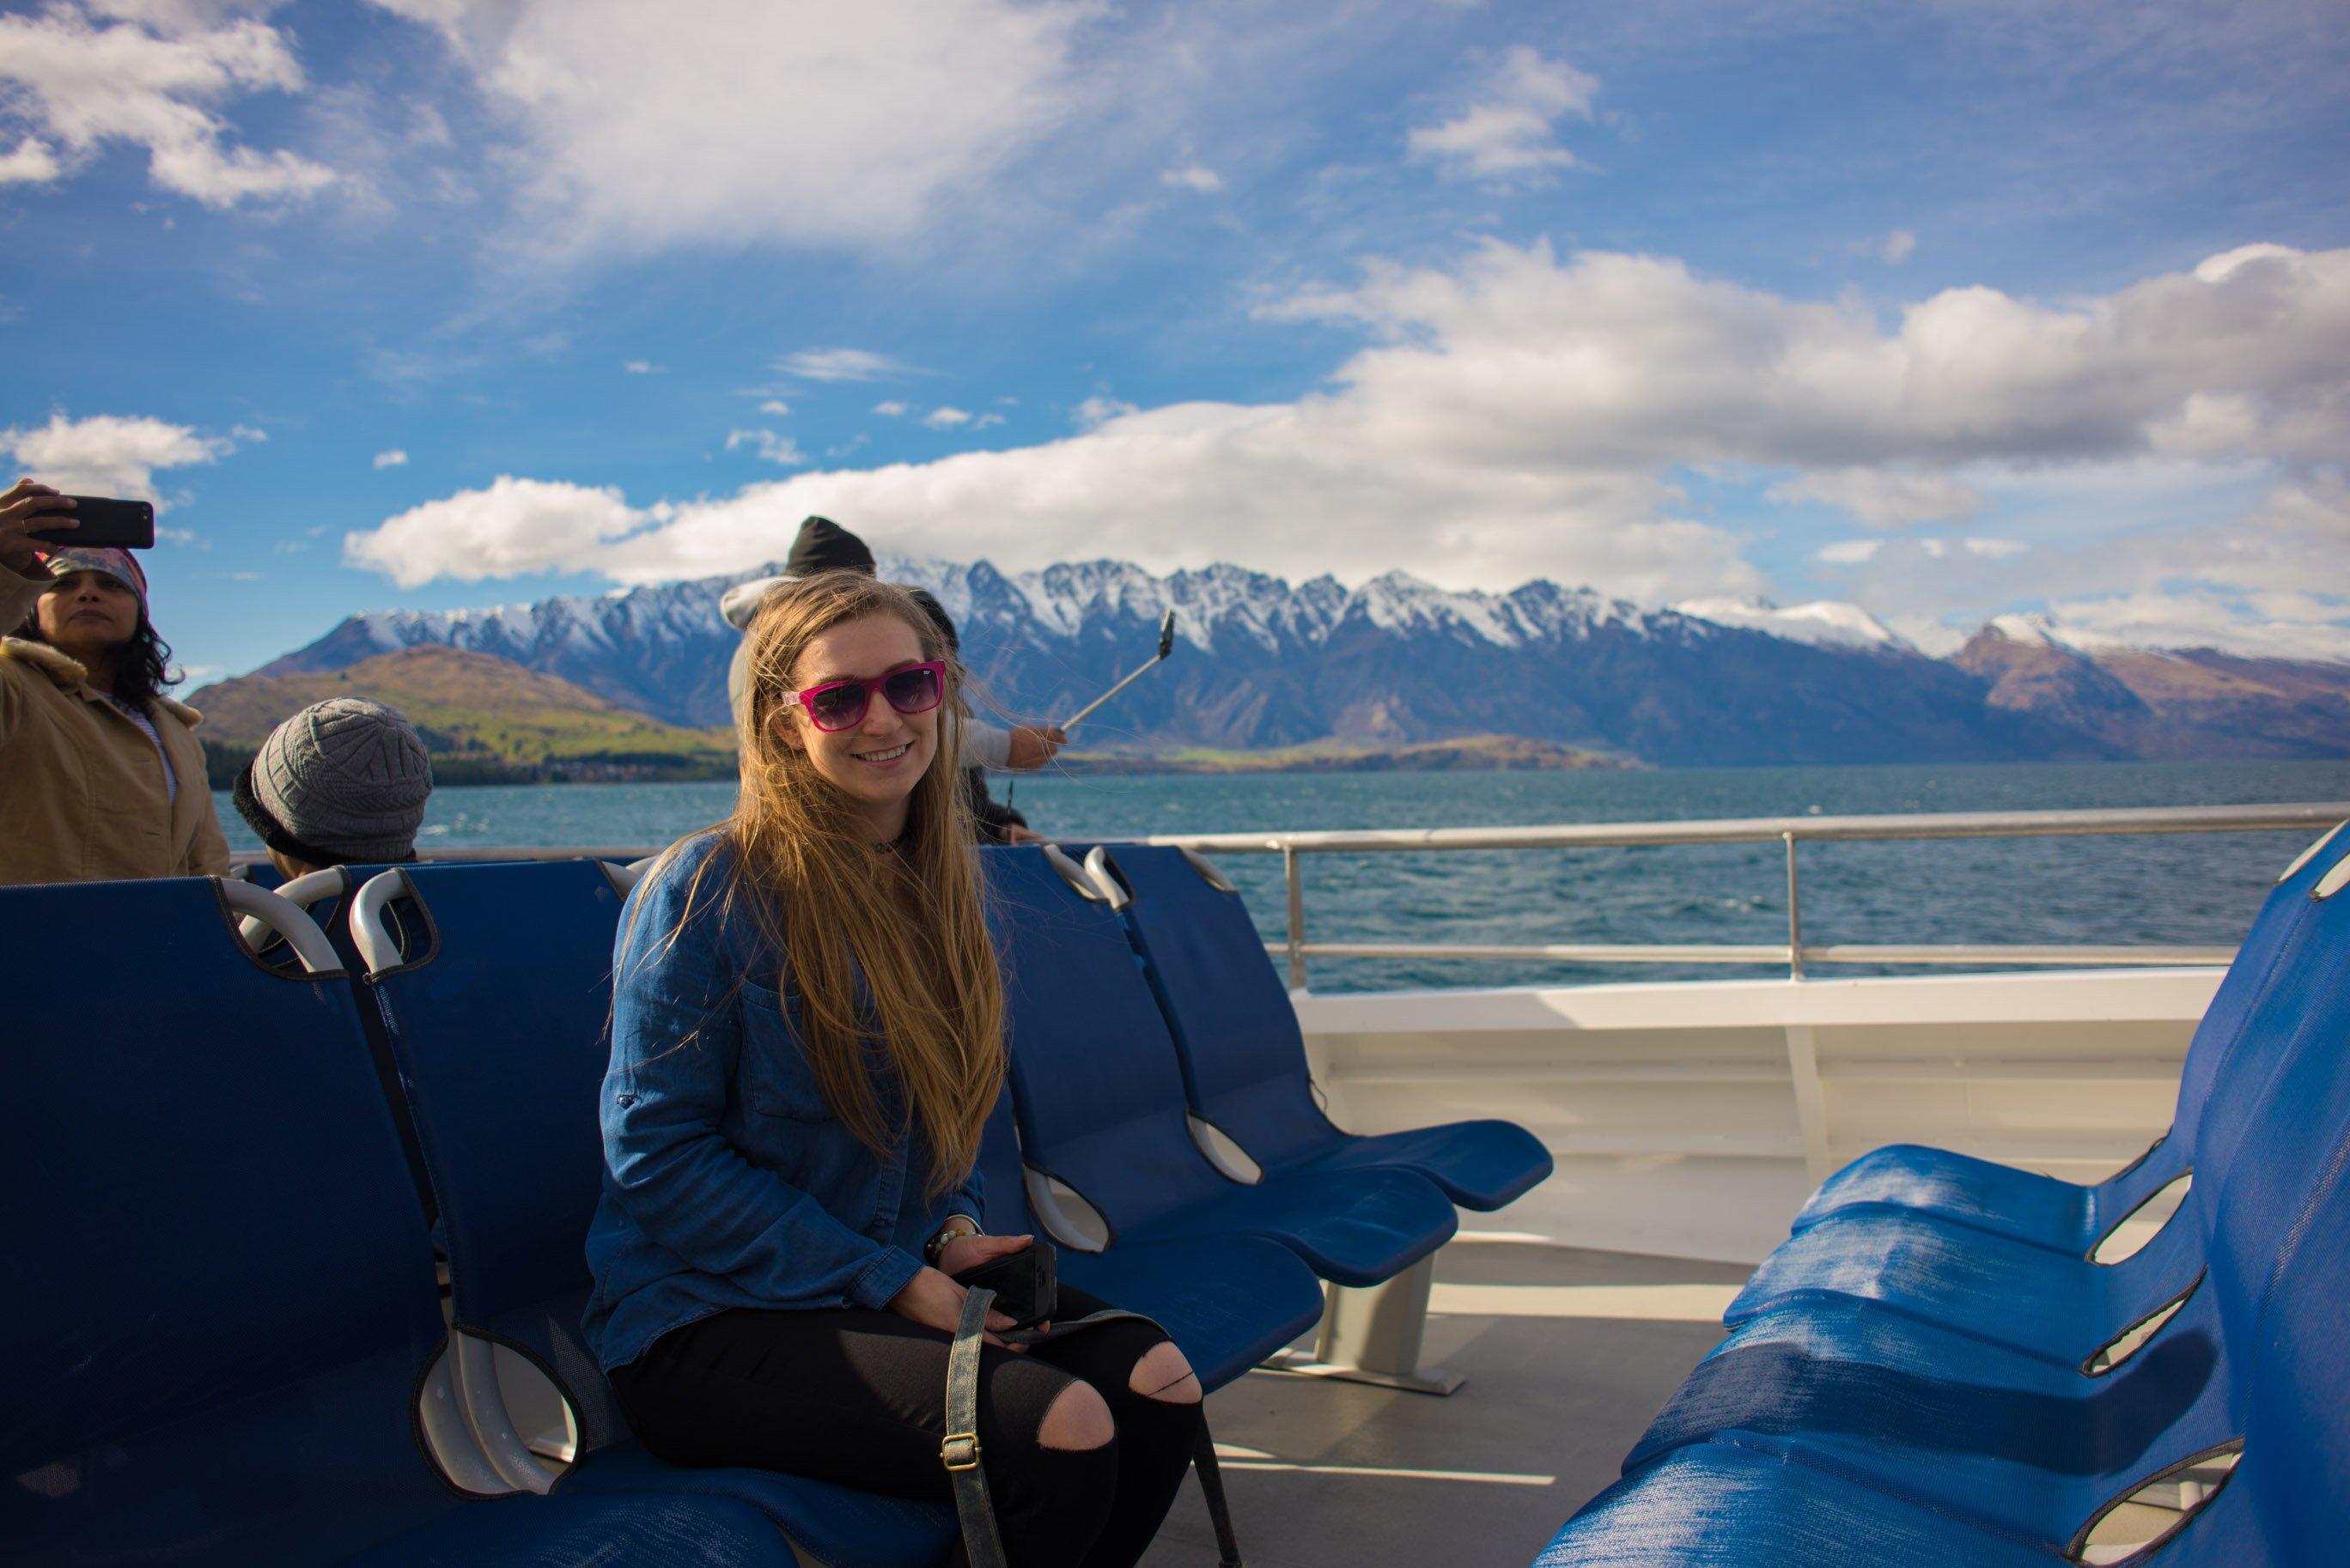 Enjoying the spirit of queenstown scenic cruise